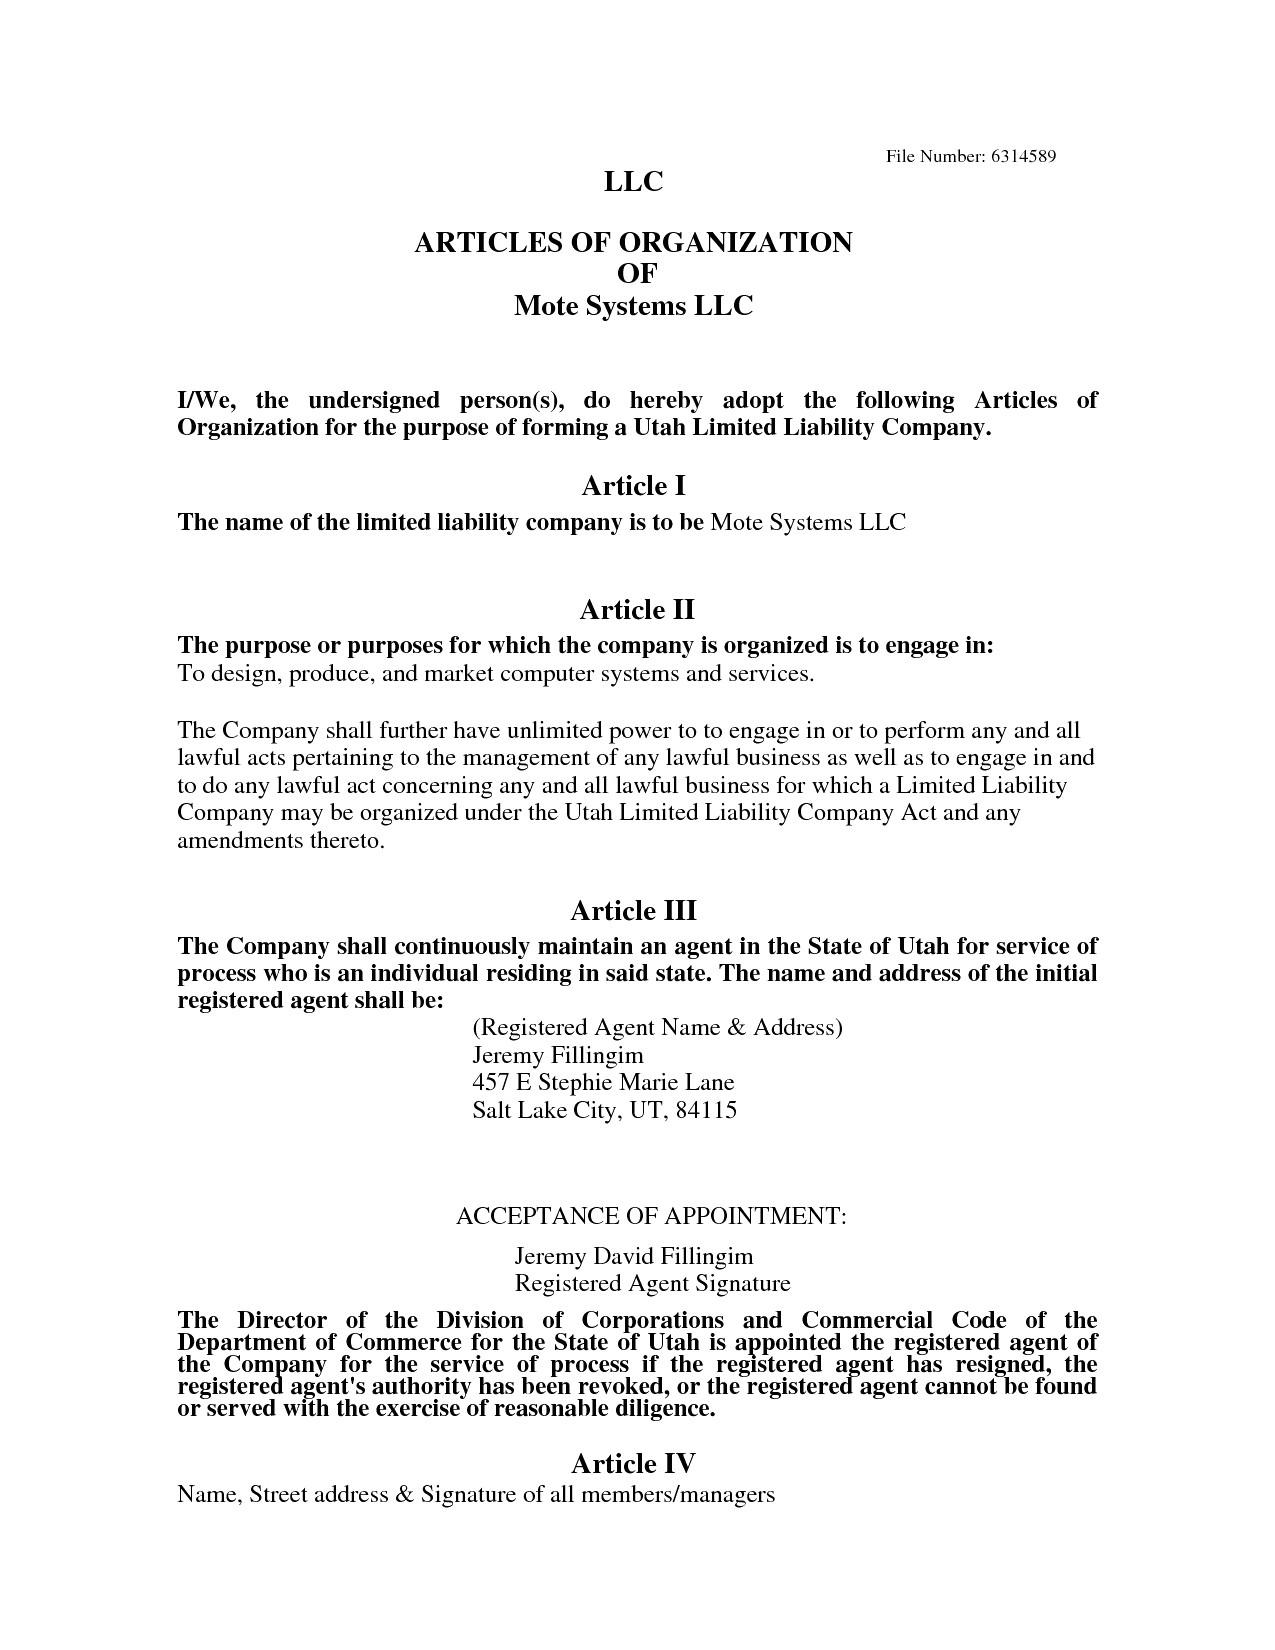 Iowa Llc Certificate Of organization Template Llc Articles Of organization Template Images